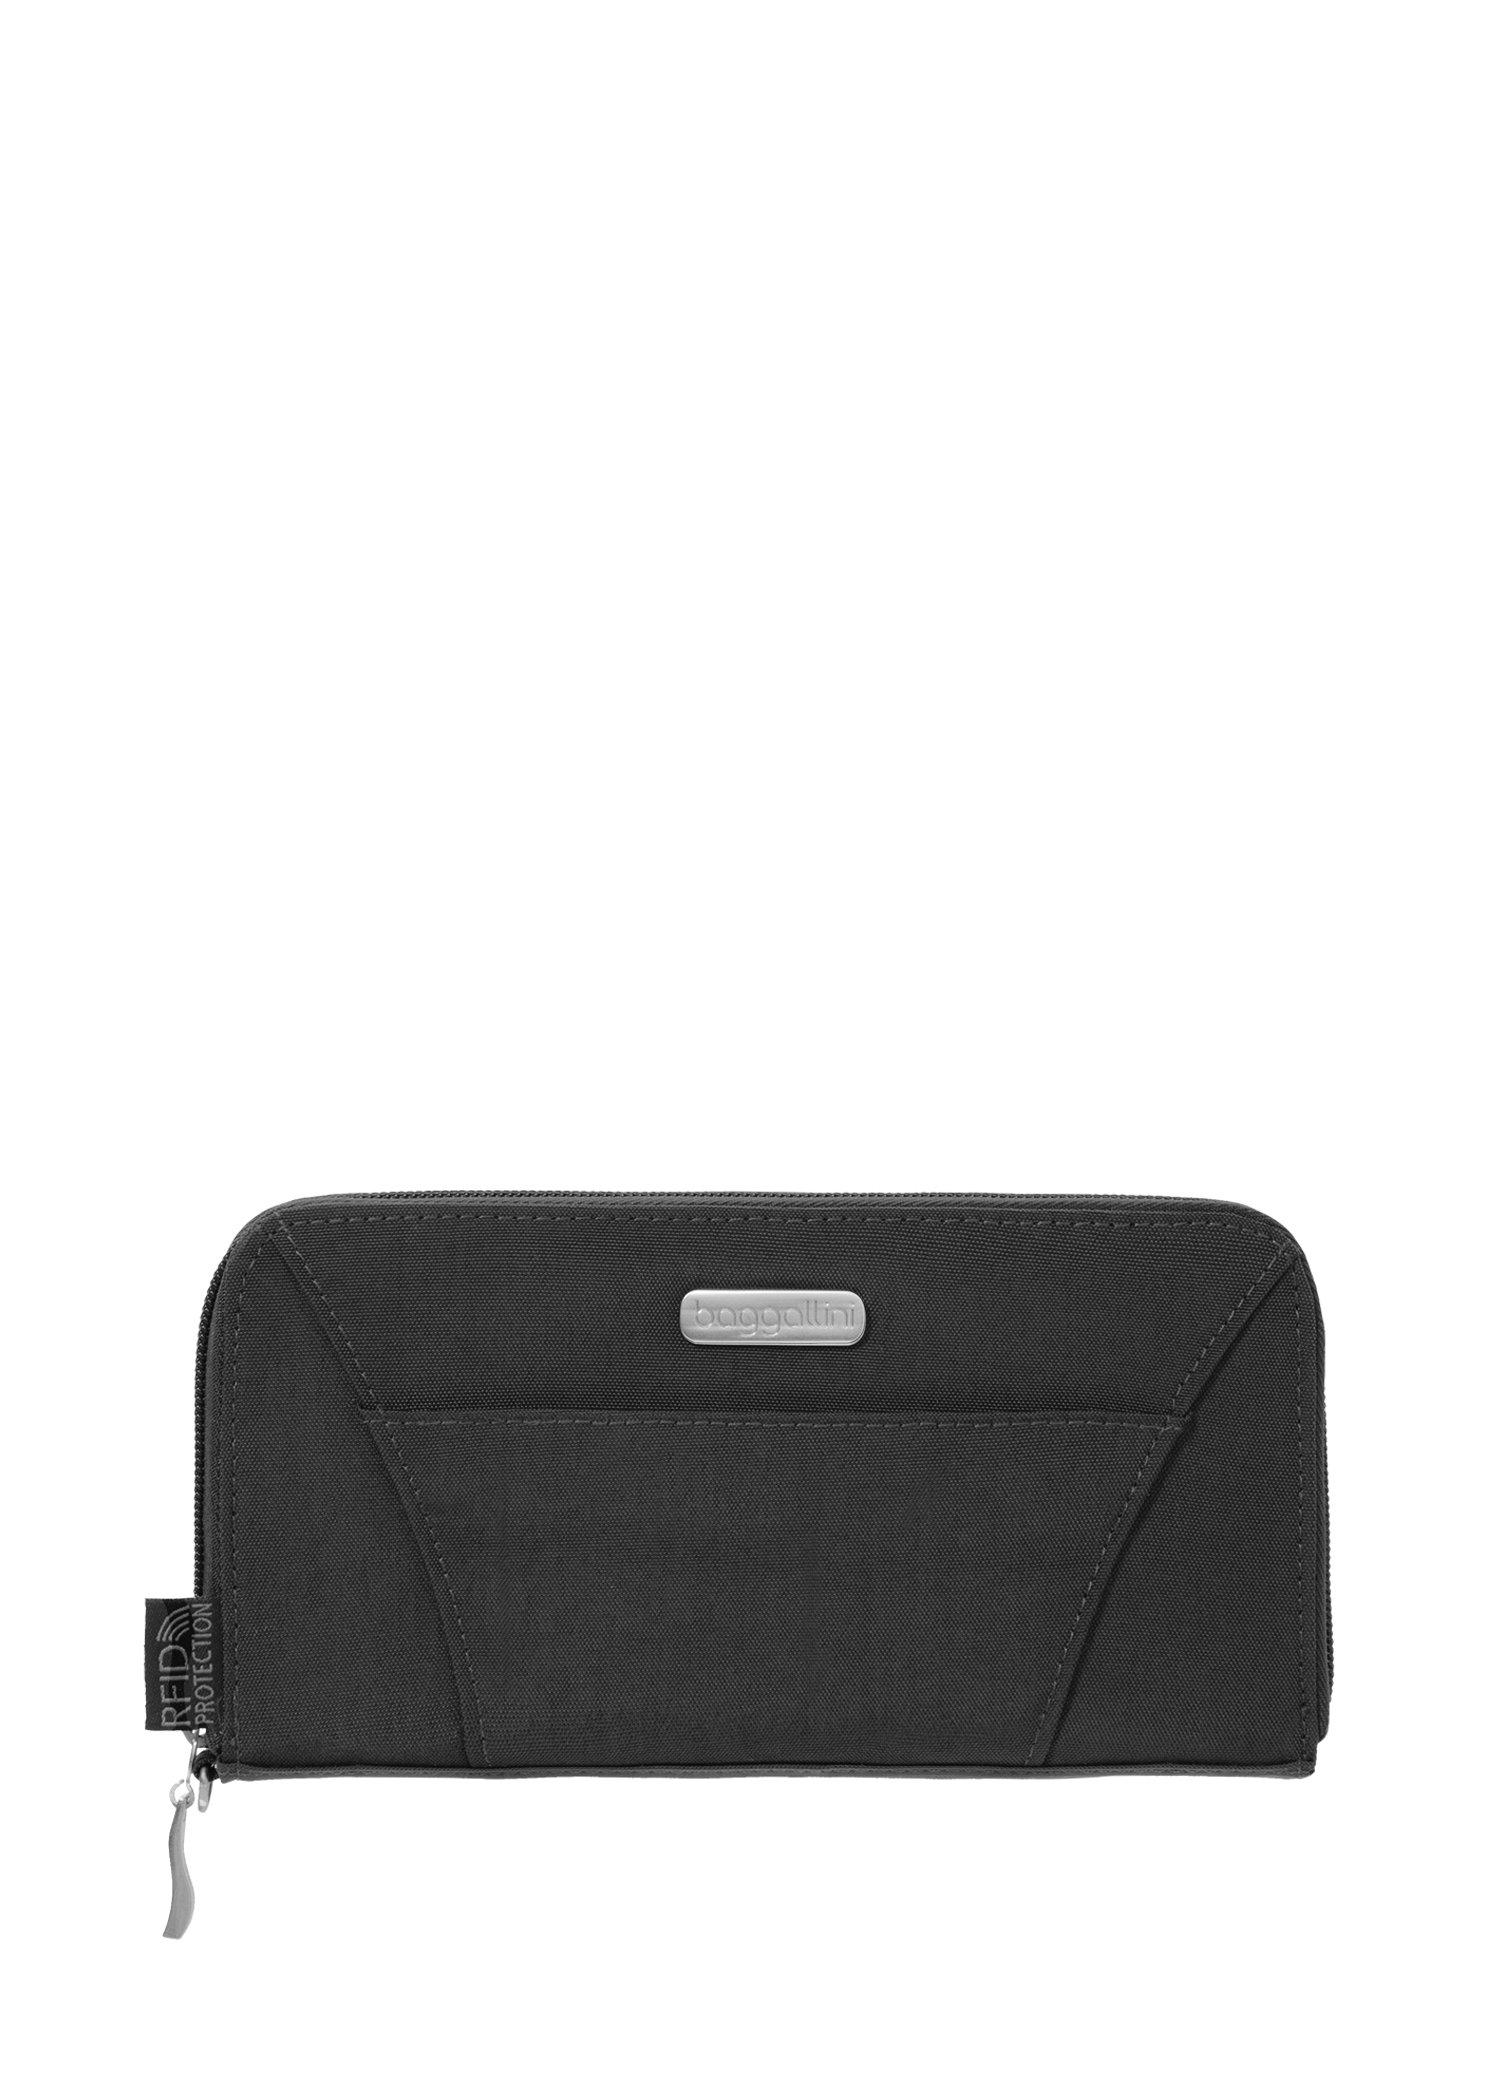 Baggallini RFID Travel Wallet, Black, One Size